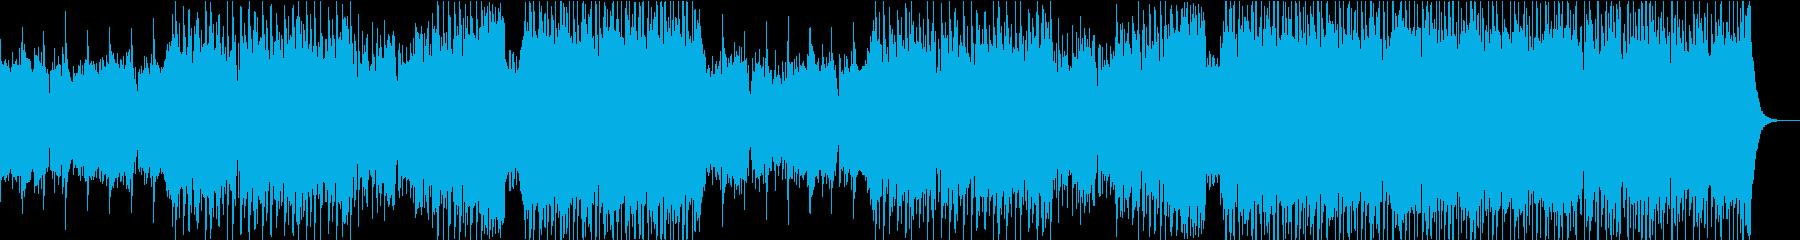 Husky voice, POPS, tropical's reproduced waveform